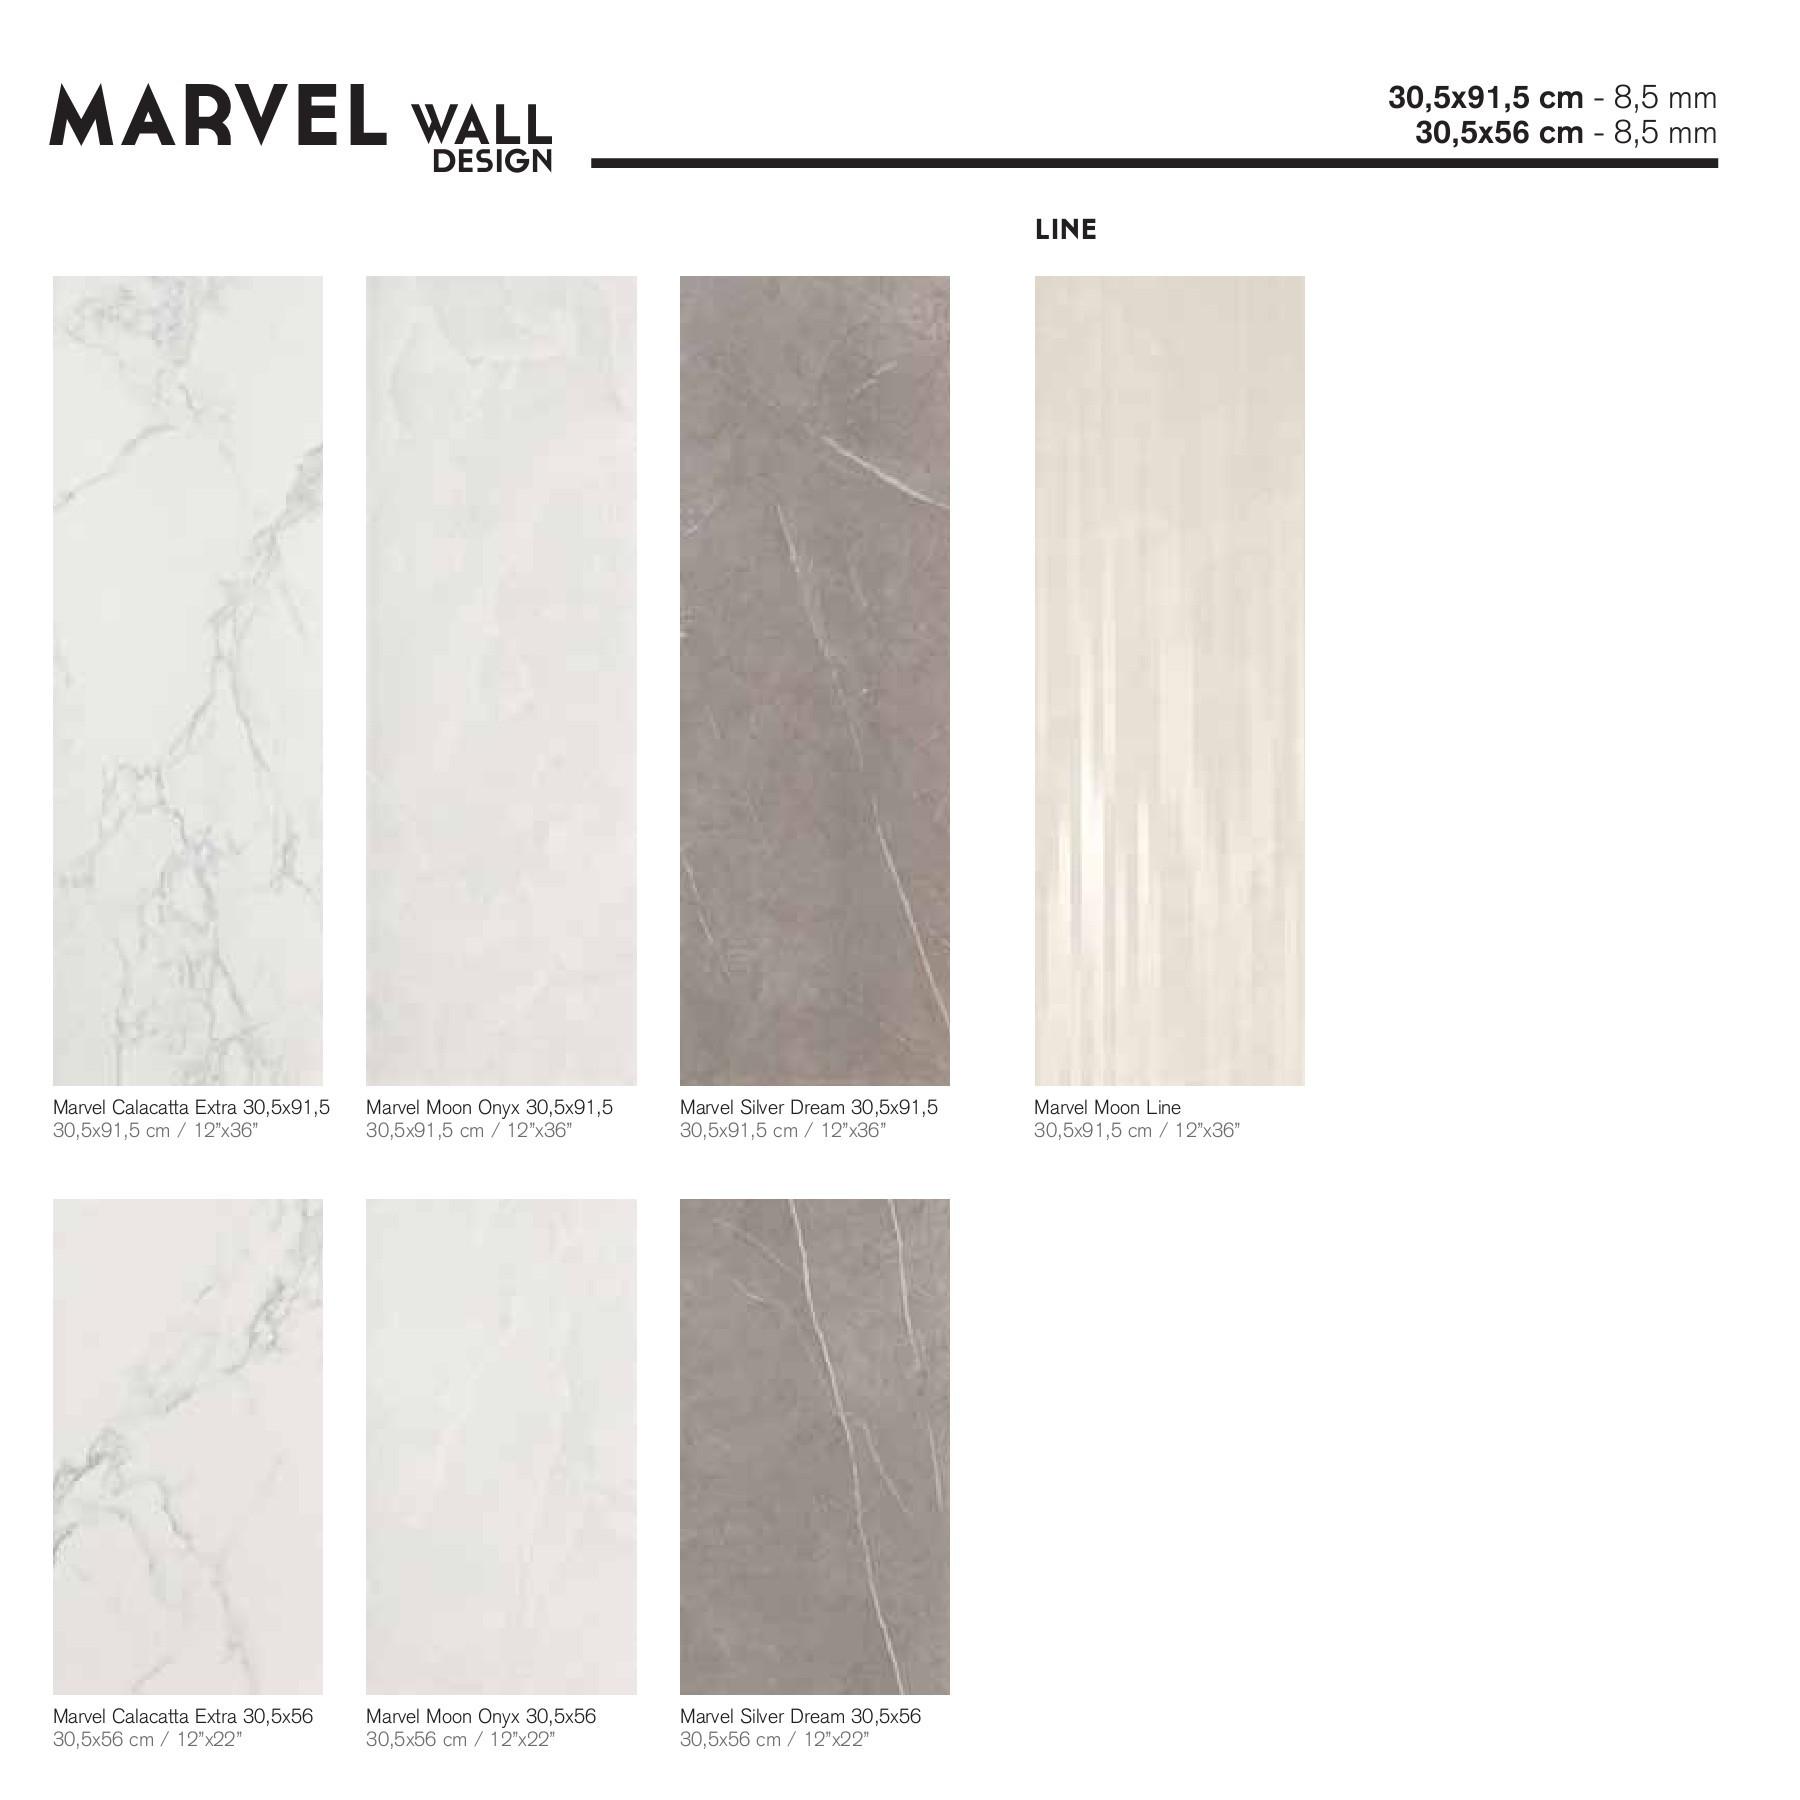 Atlas Marvel Calacatta Extra marvel floor design-flip book pages 101-112 | pubhtml5